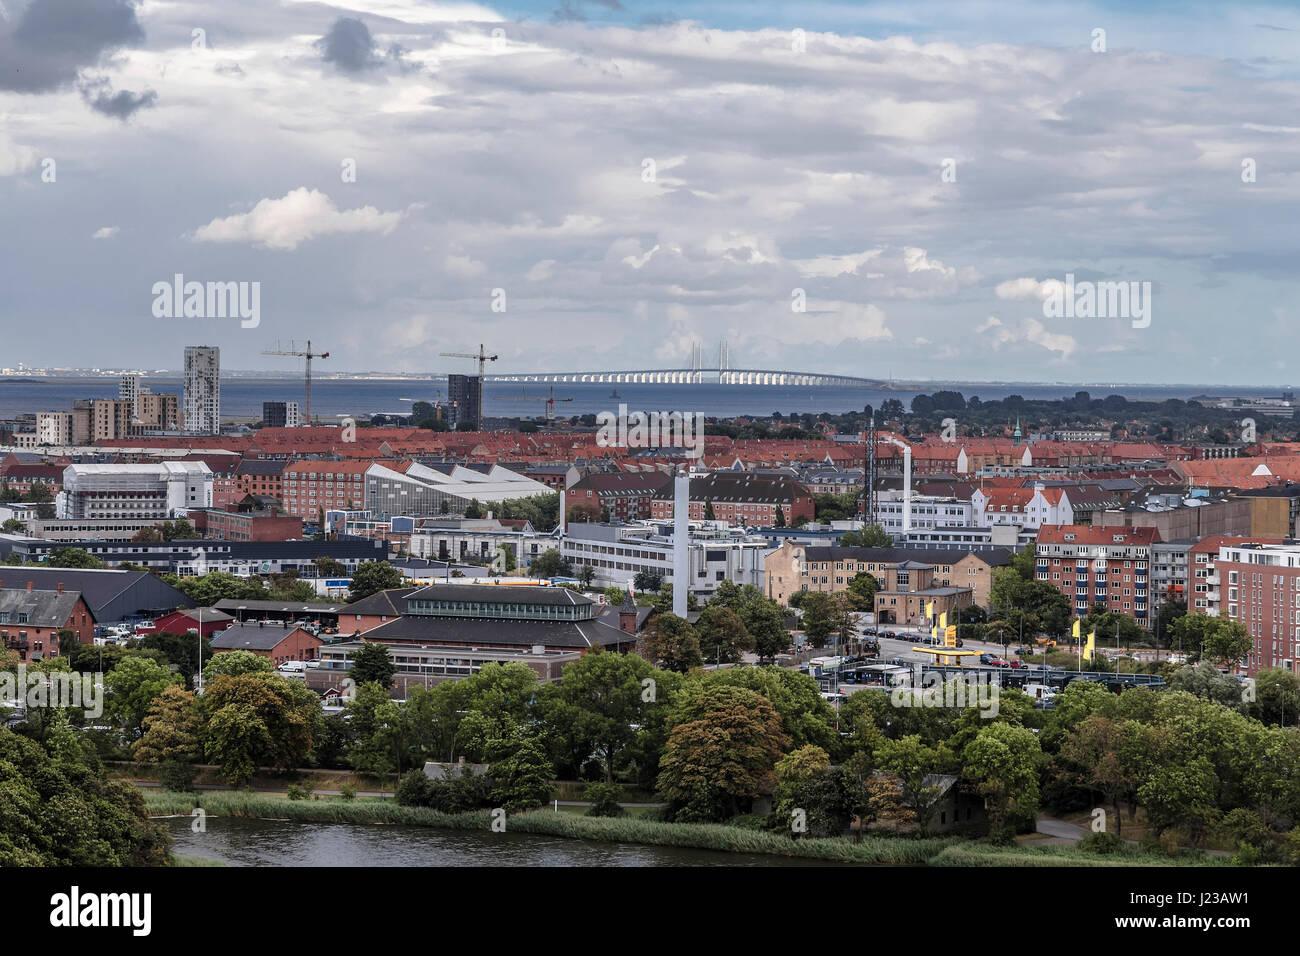 View of the Copenhagen and Erusunnsky Bridge - Stock Image